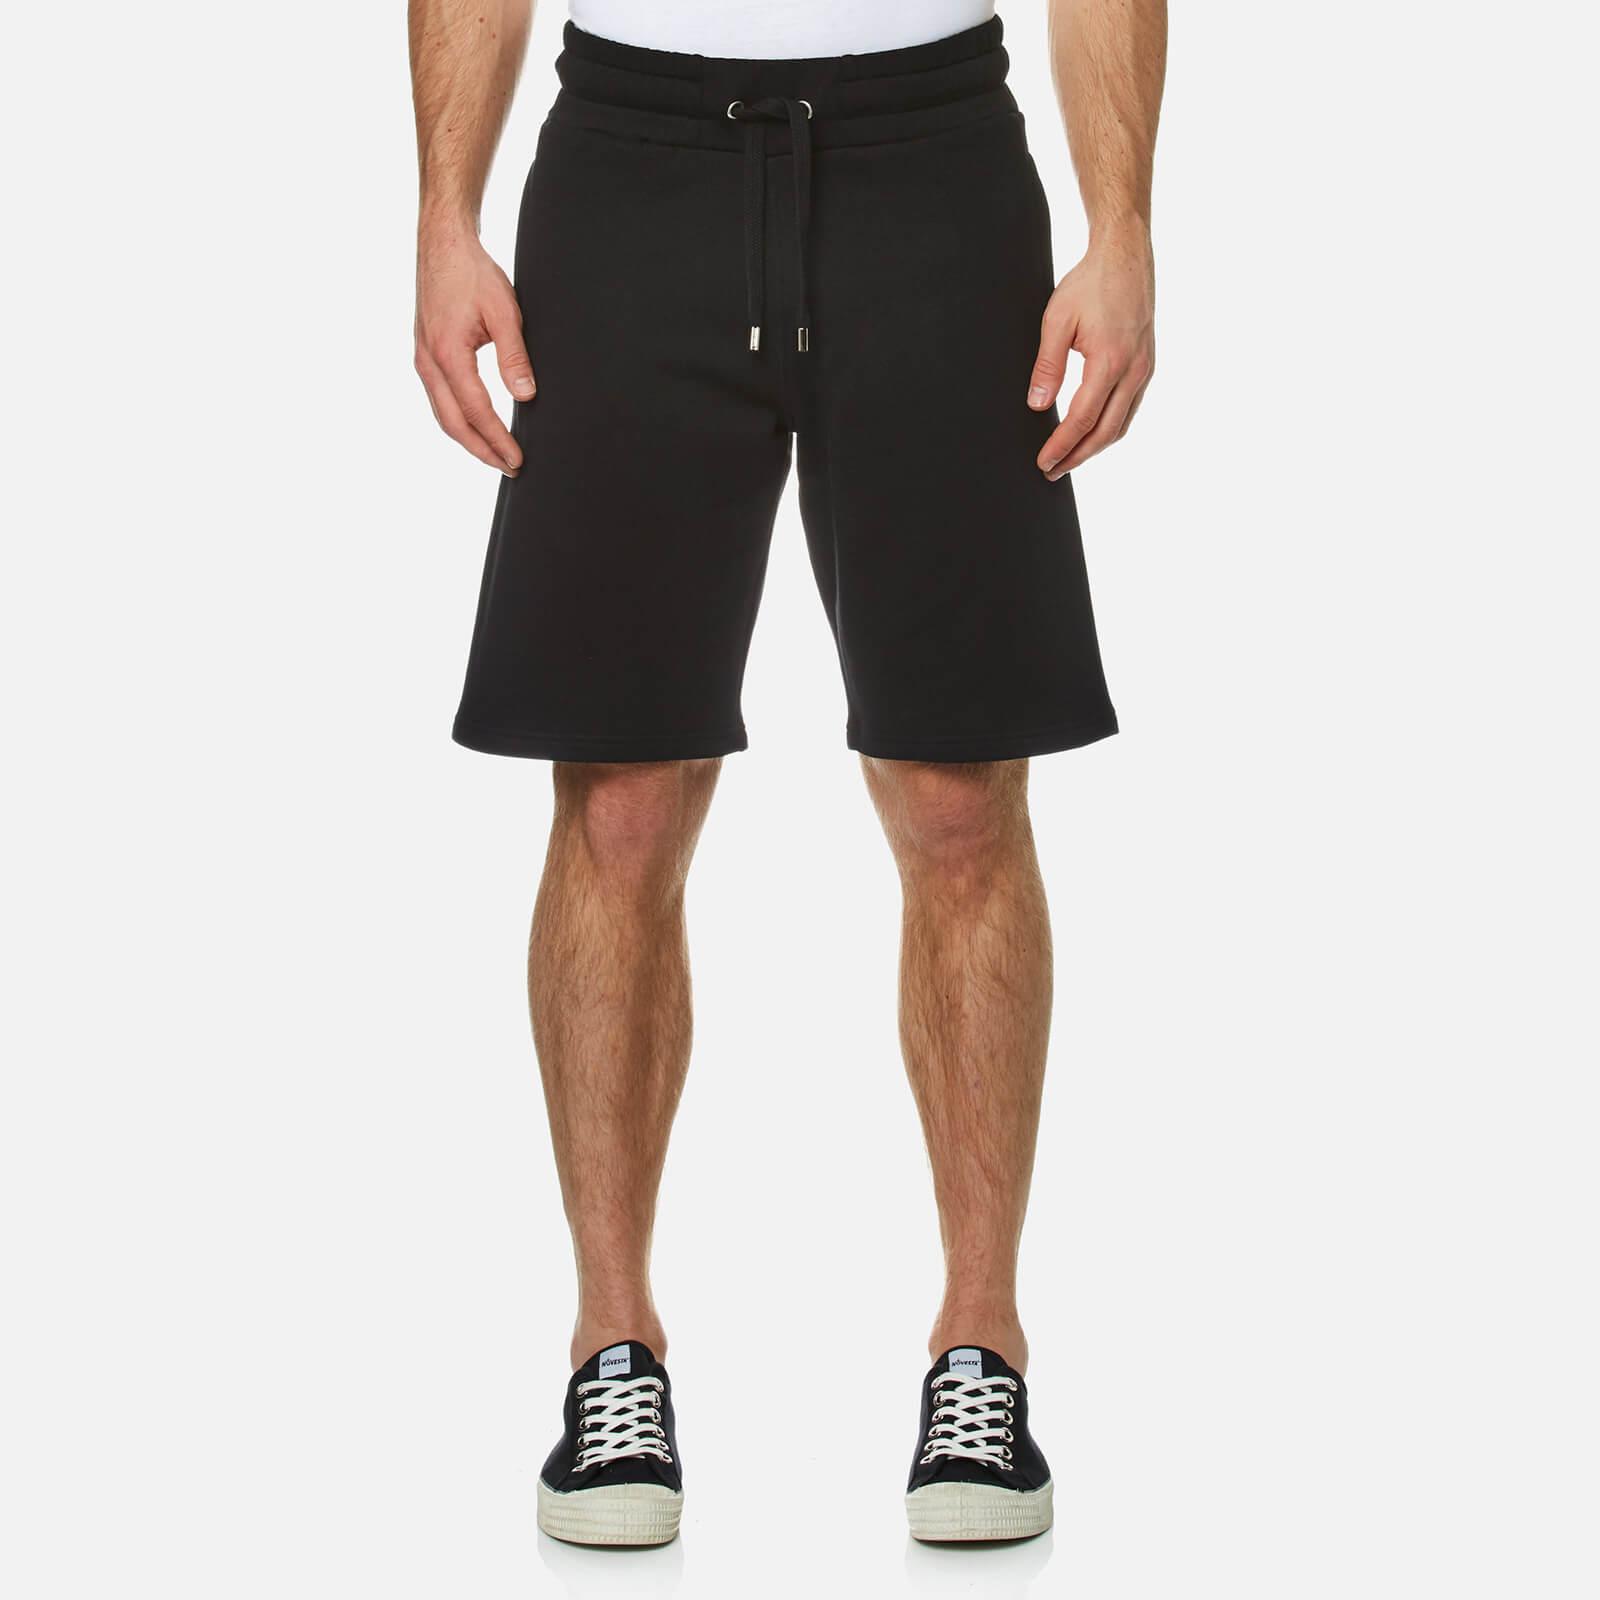 bf1fb568 KENZO Men's Kenzo Paris Logo Side Shorts - Black - Free UK Delivery over £50